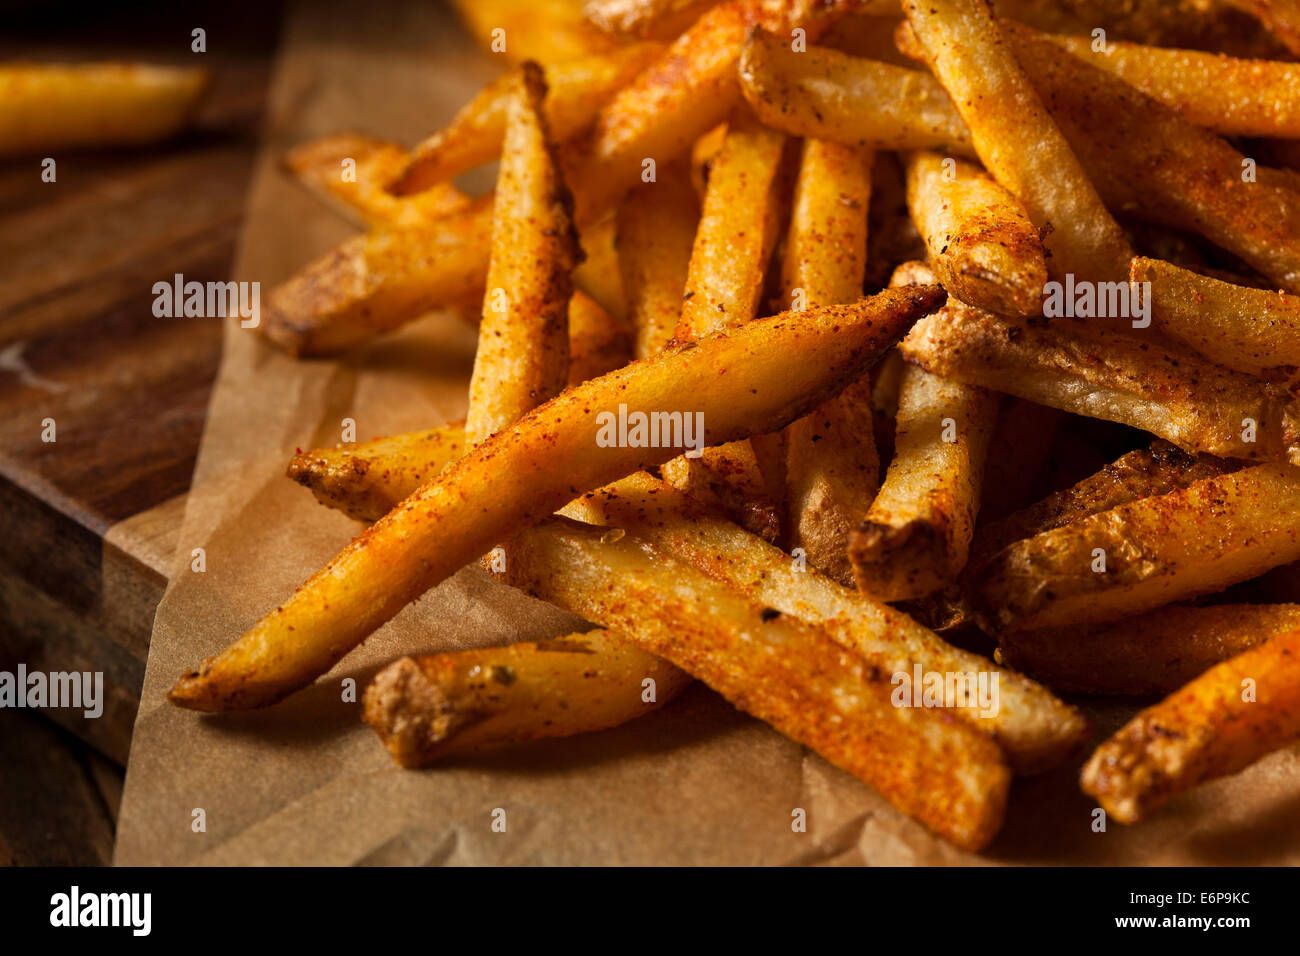 Assaisonnée Cajun Frites avec ketchup biologique Photo Stock